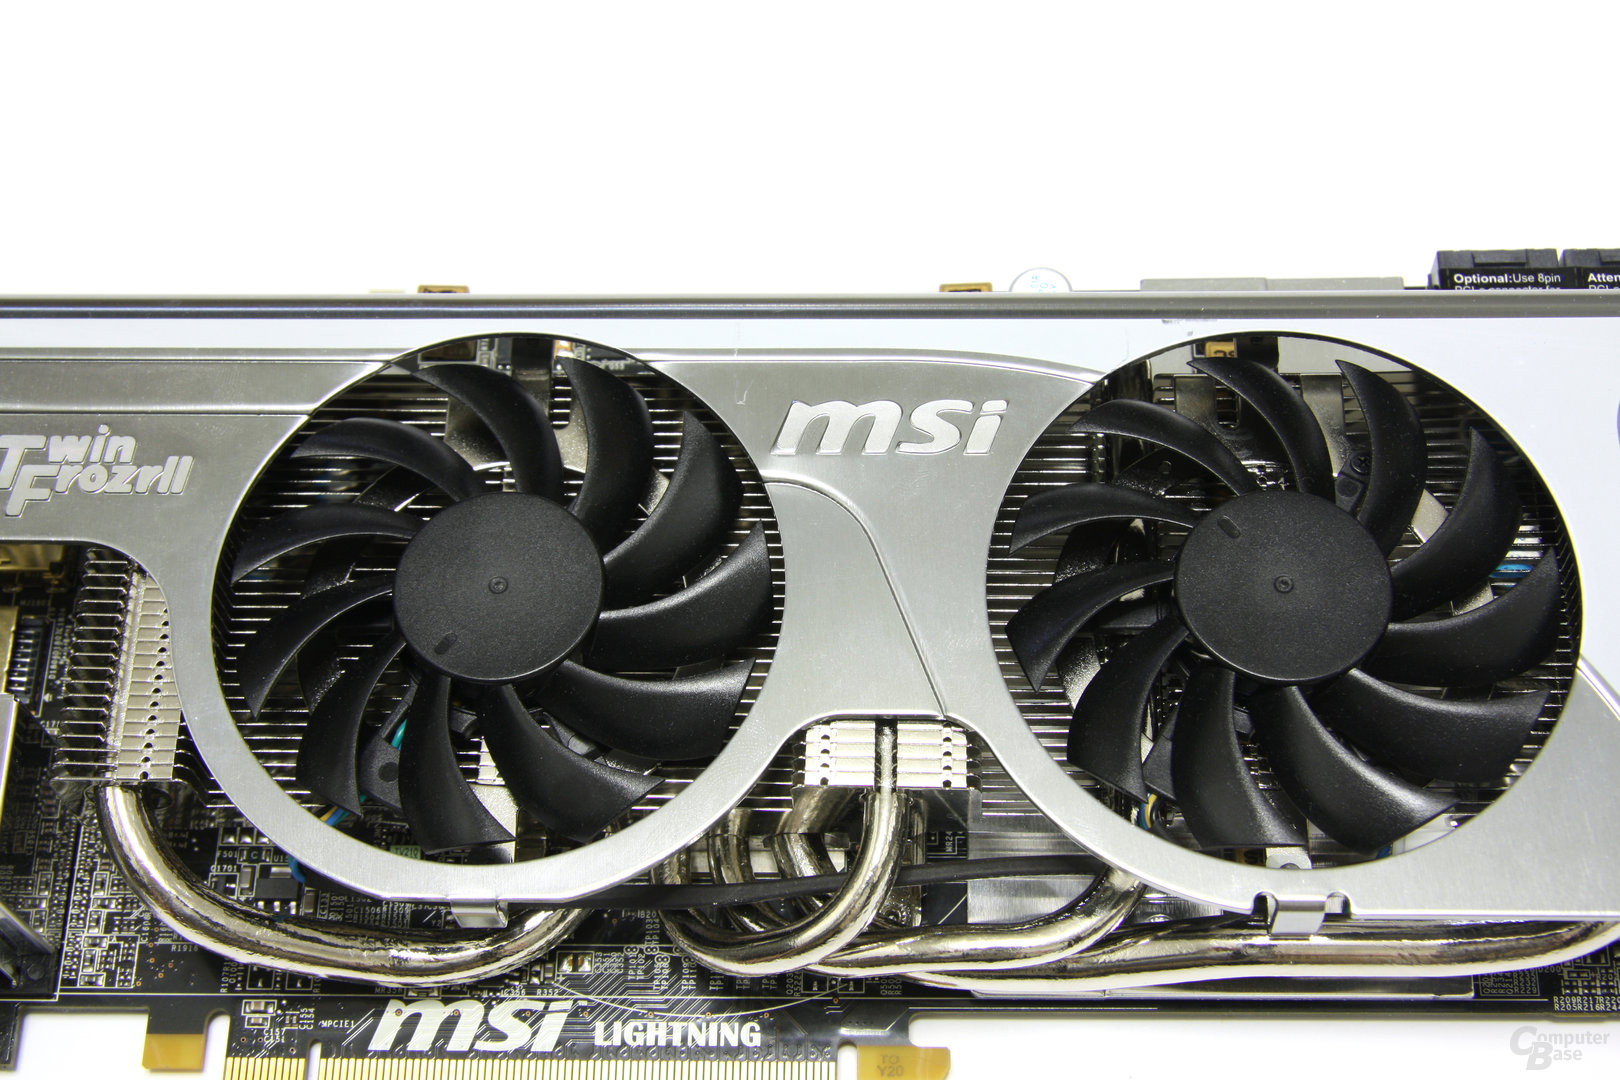 Radeon HD 5870 Lightning Kühlerdetails